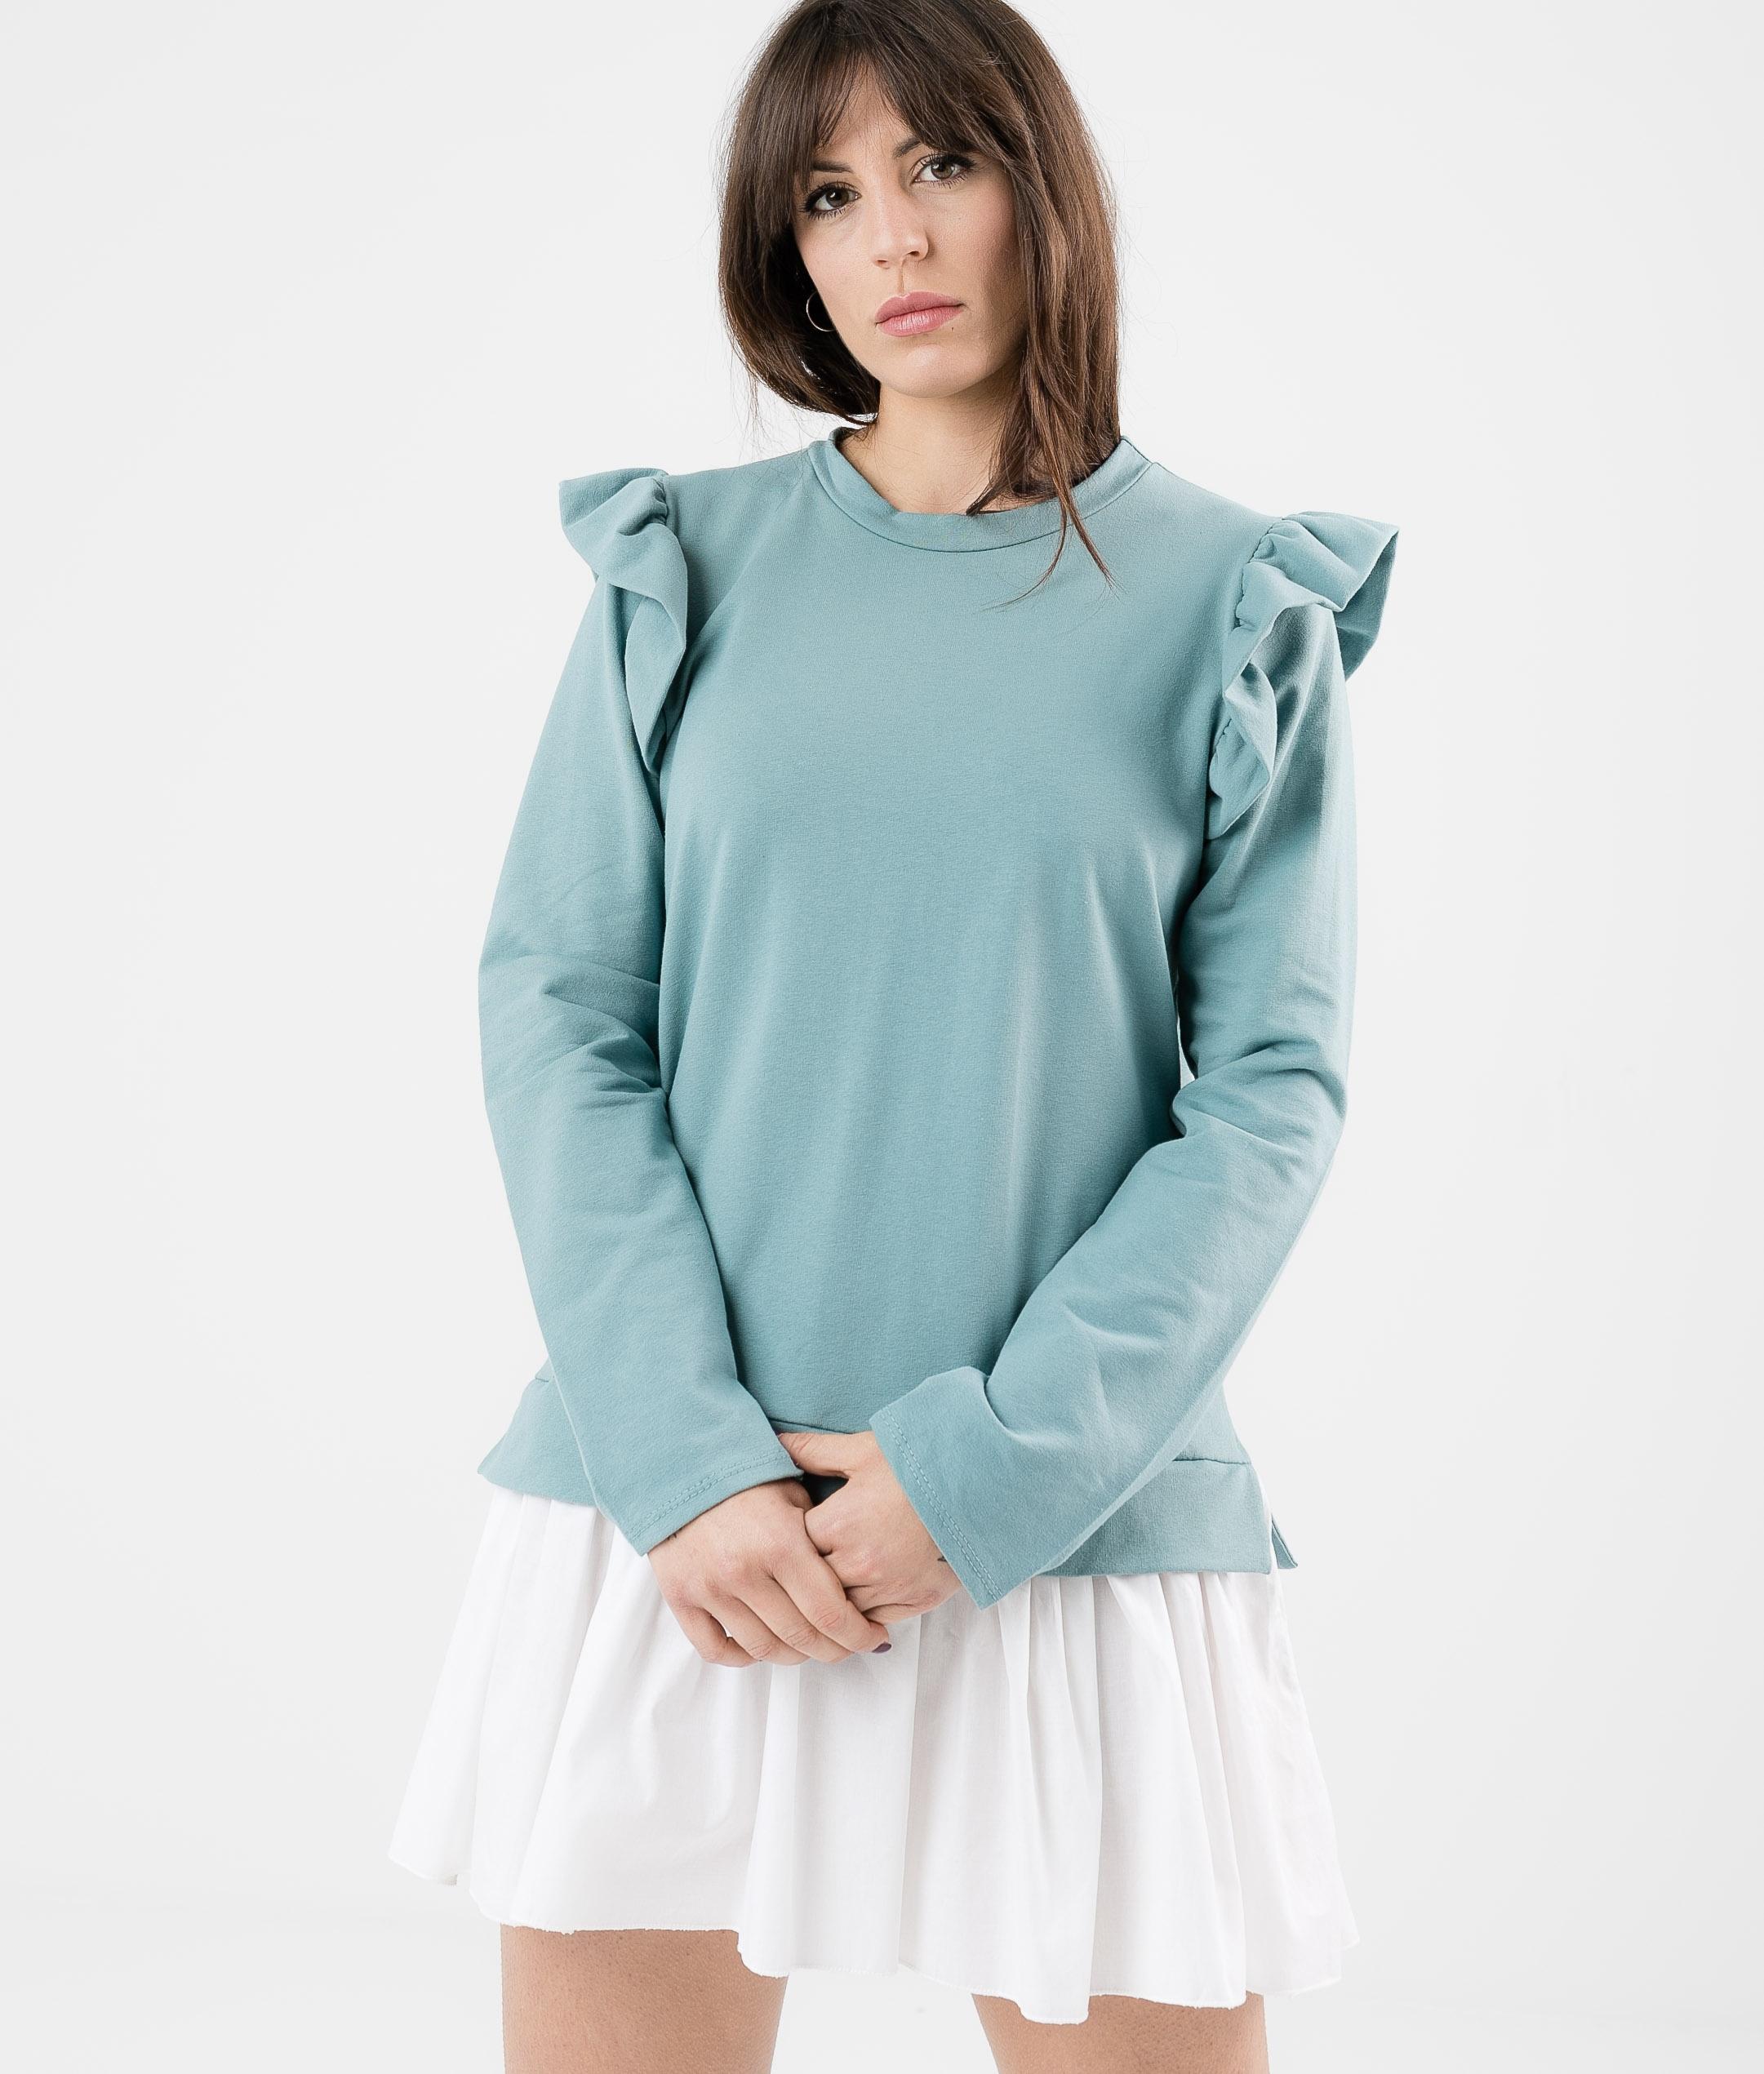 KATPUM DRESS - TURQUOISE